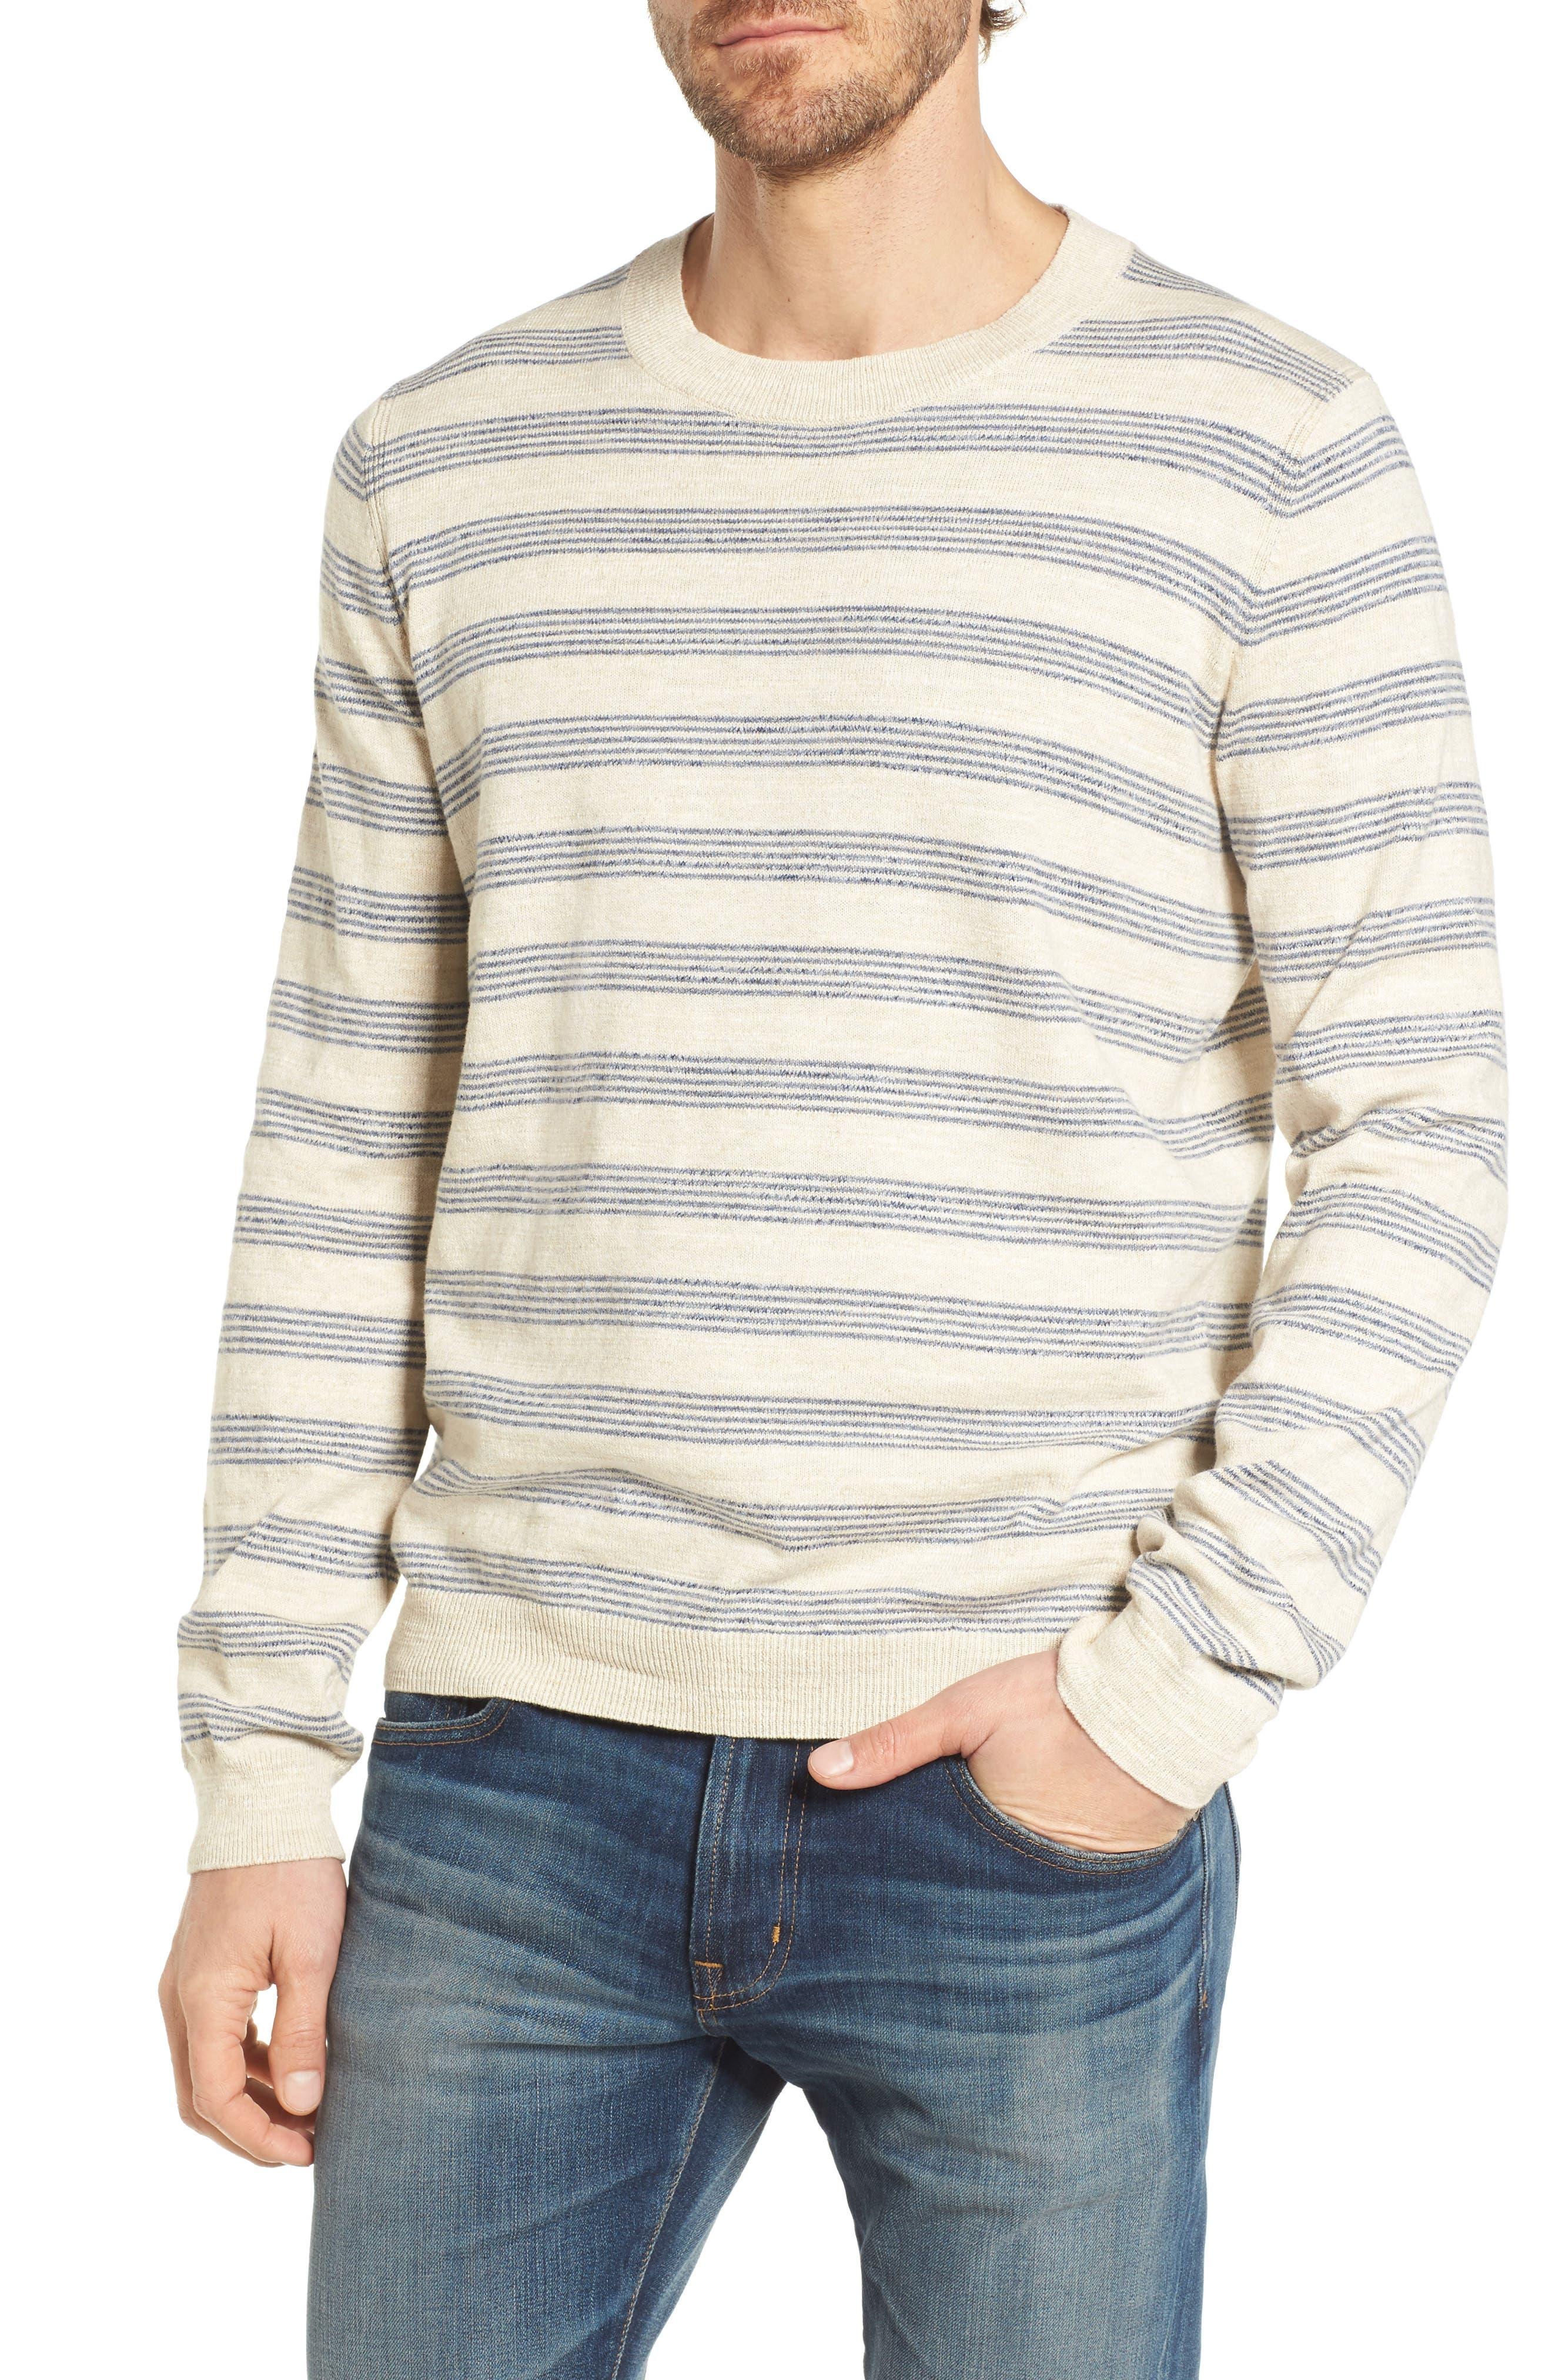 Grayers Stripe Cotton Sweater